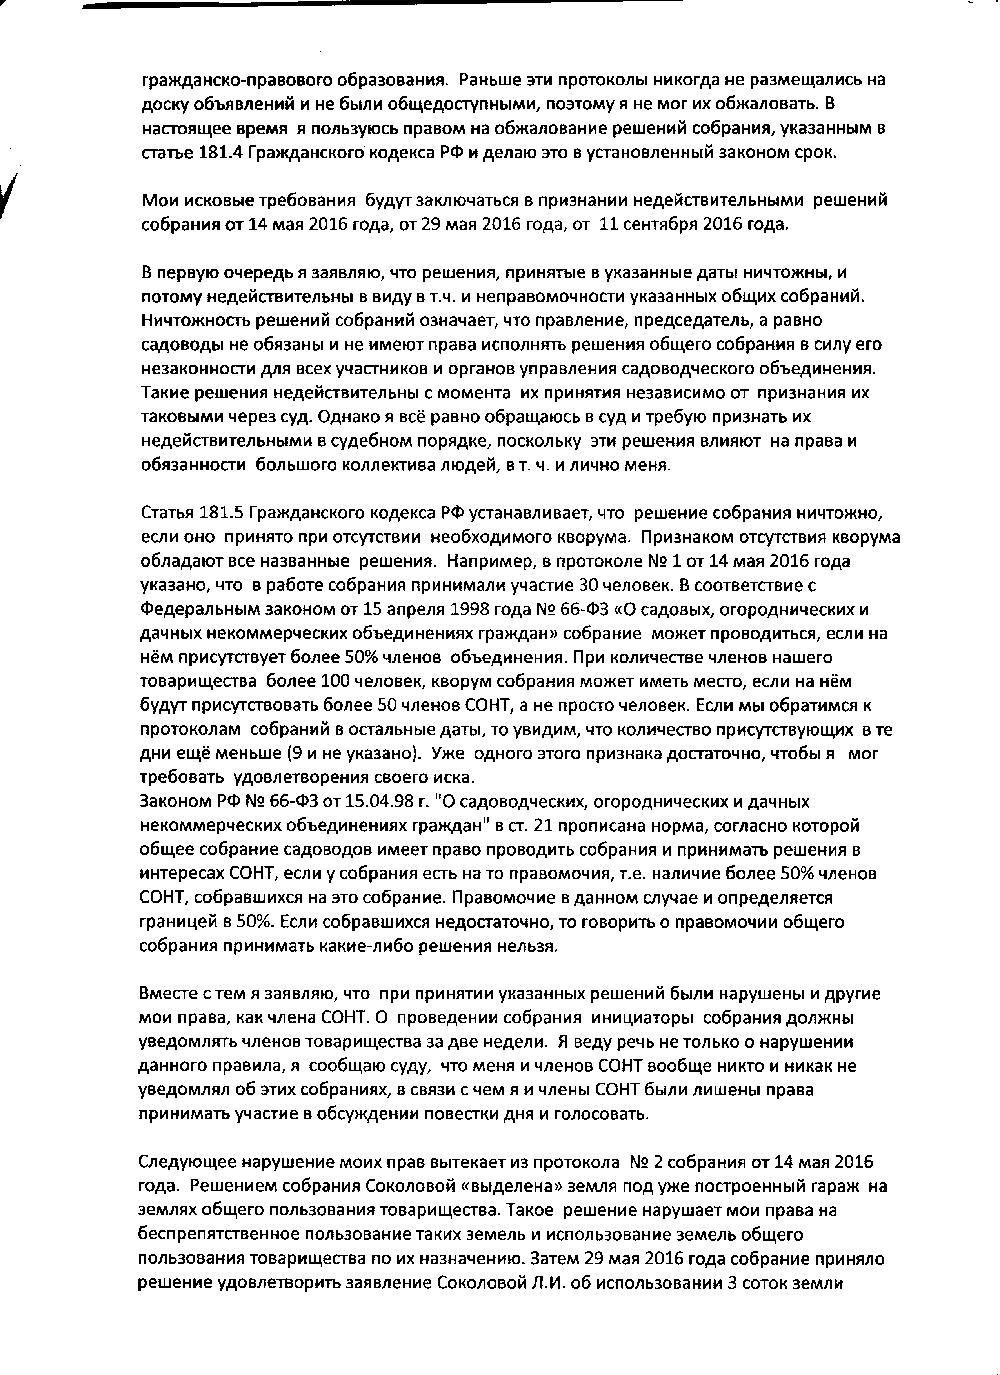 https://sontgranit.ru/forum/img/sokol/скан-иска-02.png